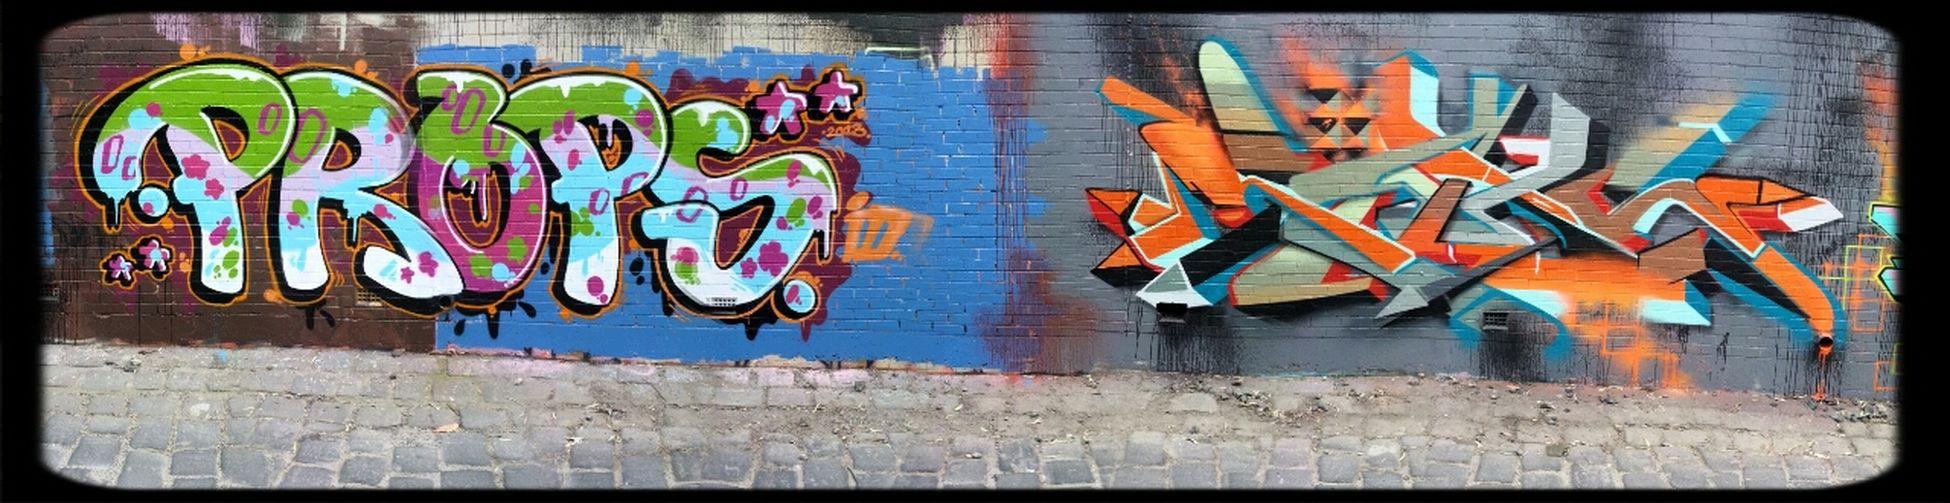 S4be7h & Props Graffiti writers Streetart in melburn